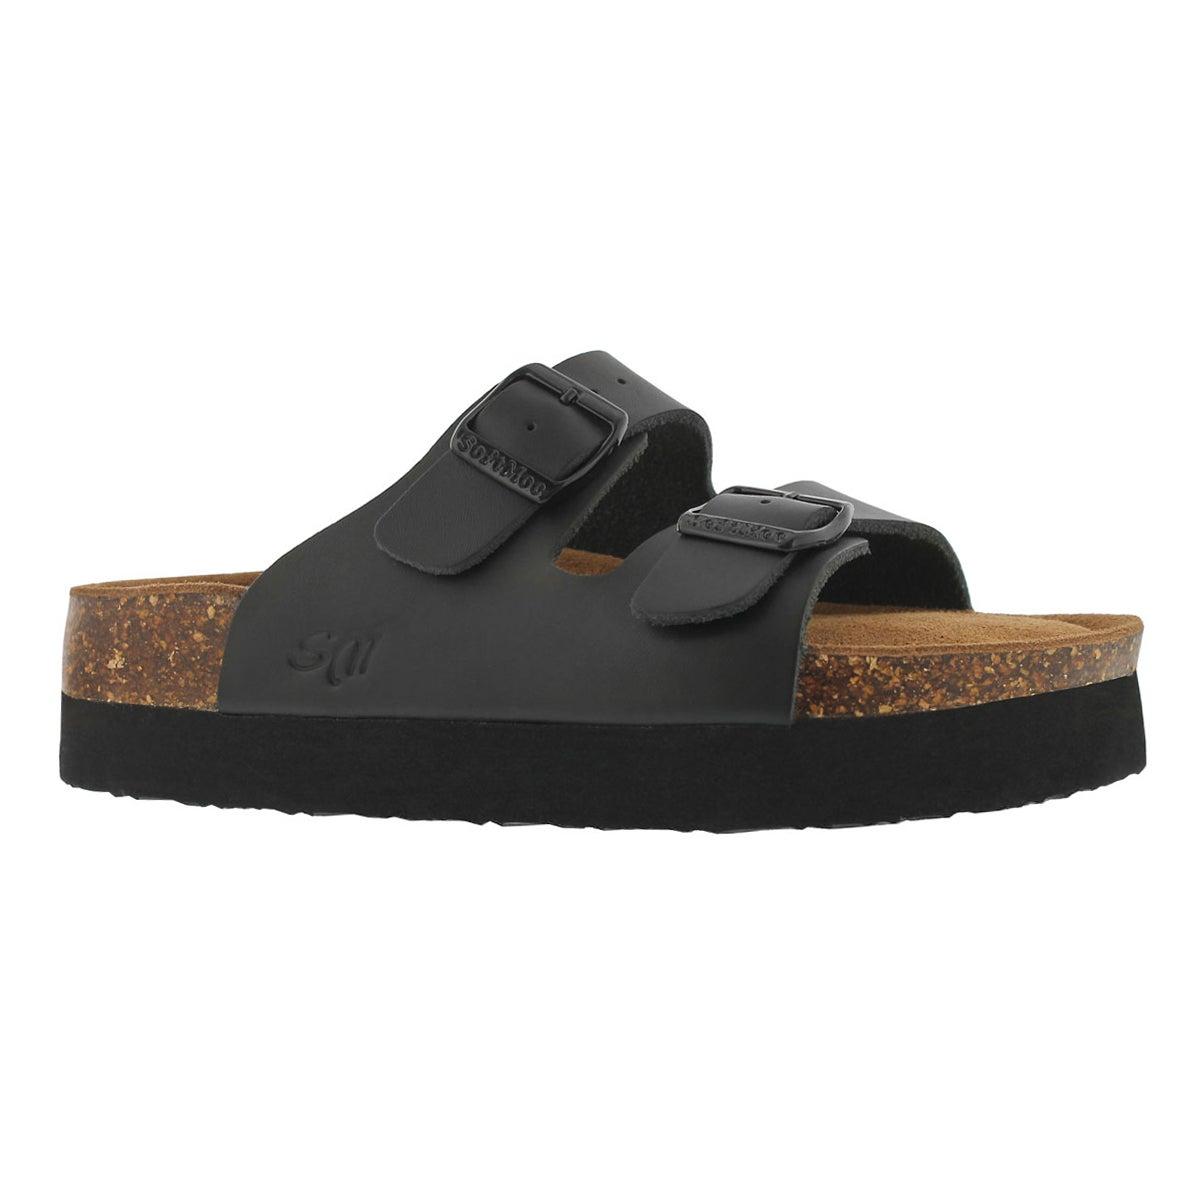 Women's ALIYAH 5 black memory foam slide sandals